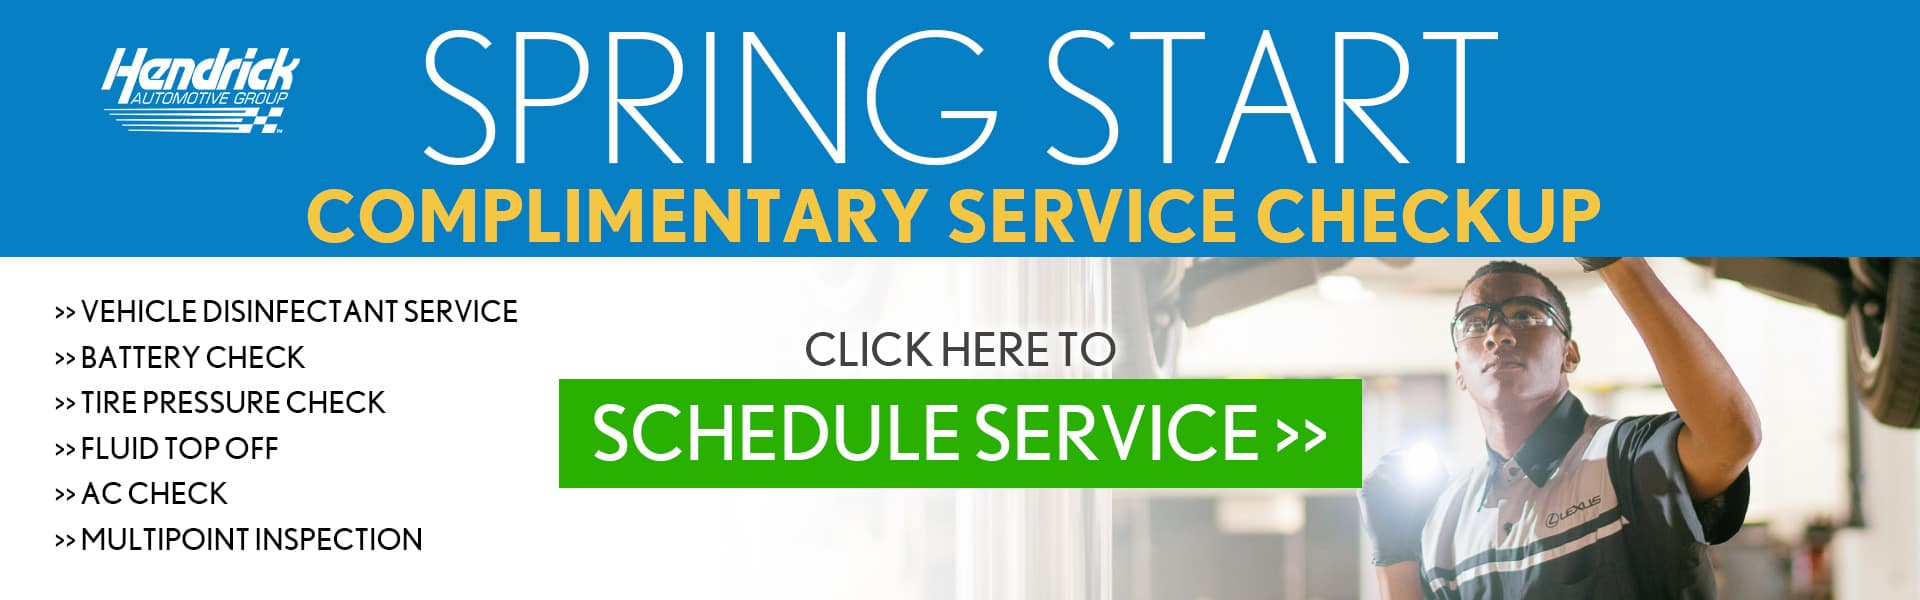 202103_HAG_Service_Homepage1